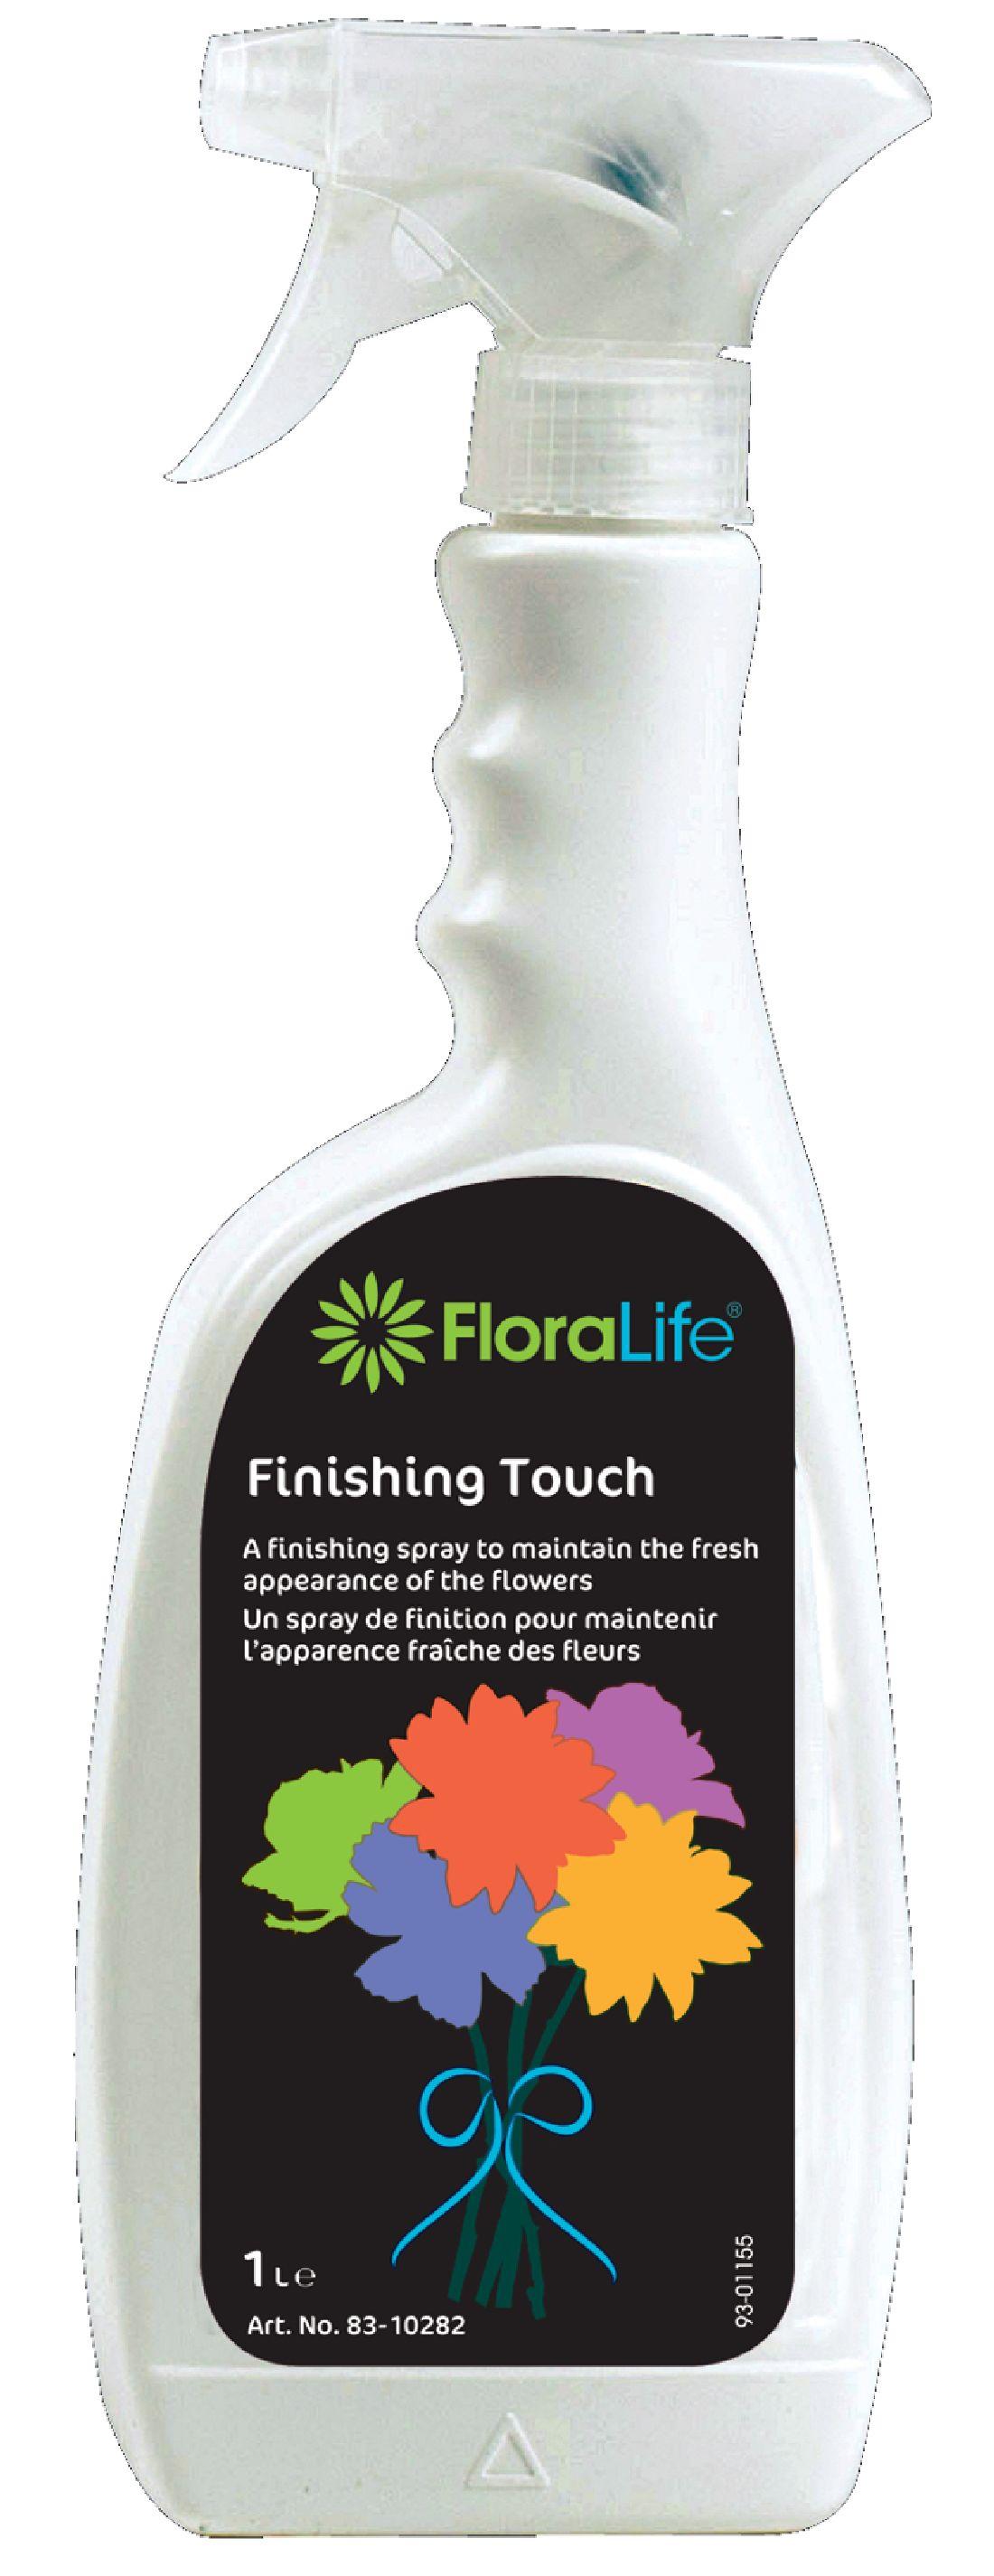 Oasis® Floralife® Finishing Touch 83-10282 1 Liter Verdunstungsschutz